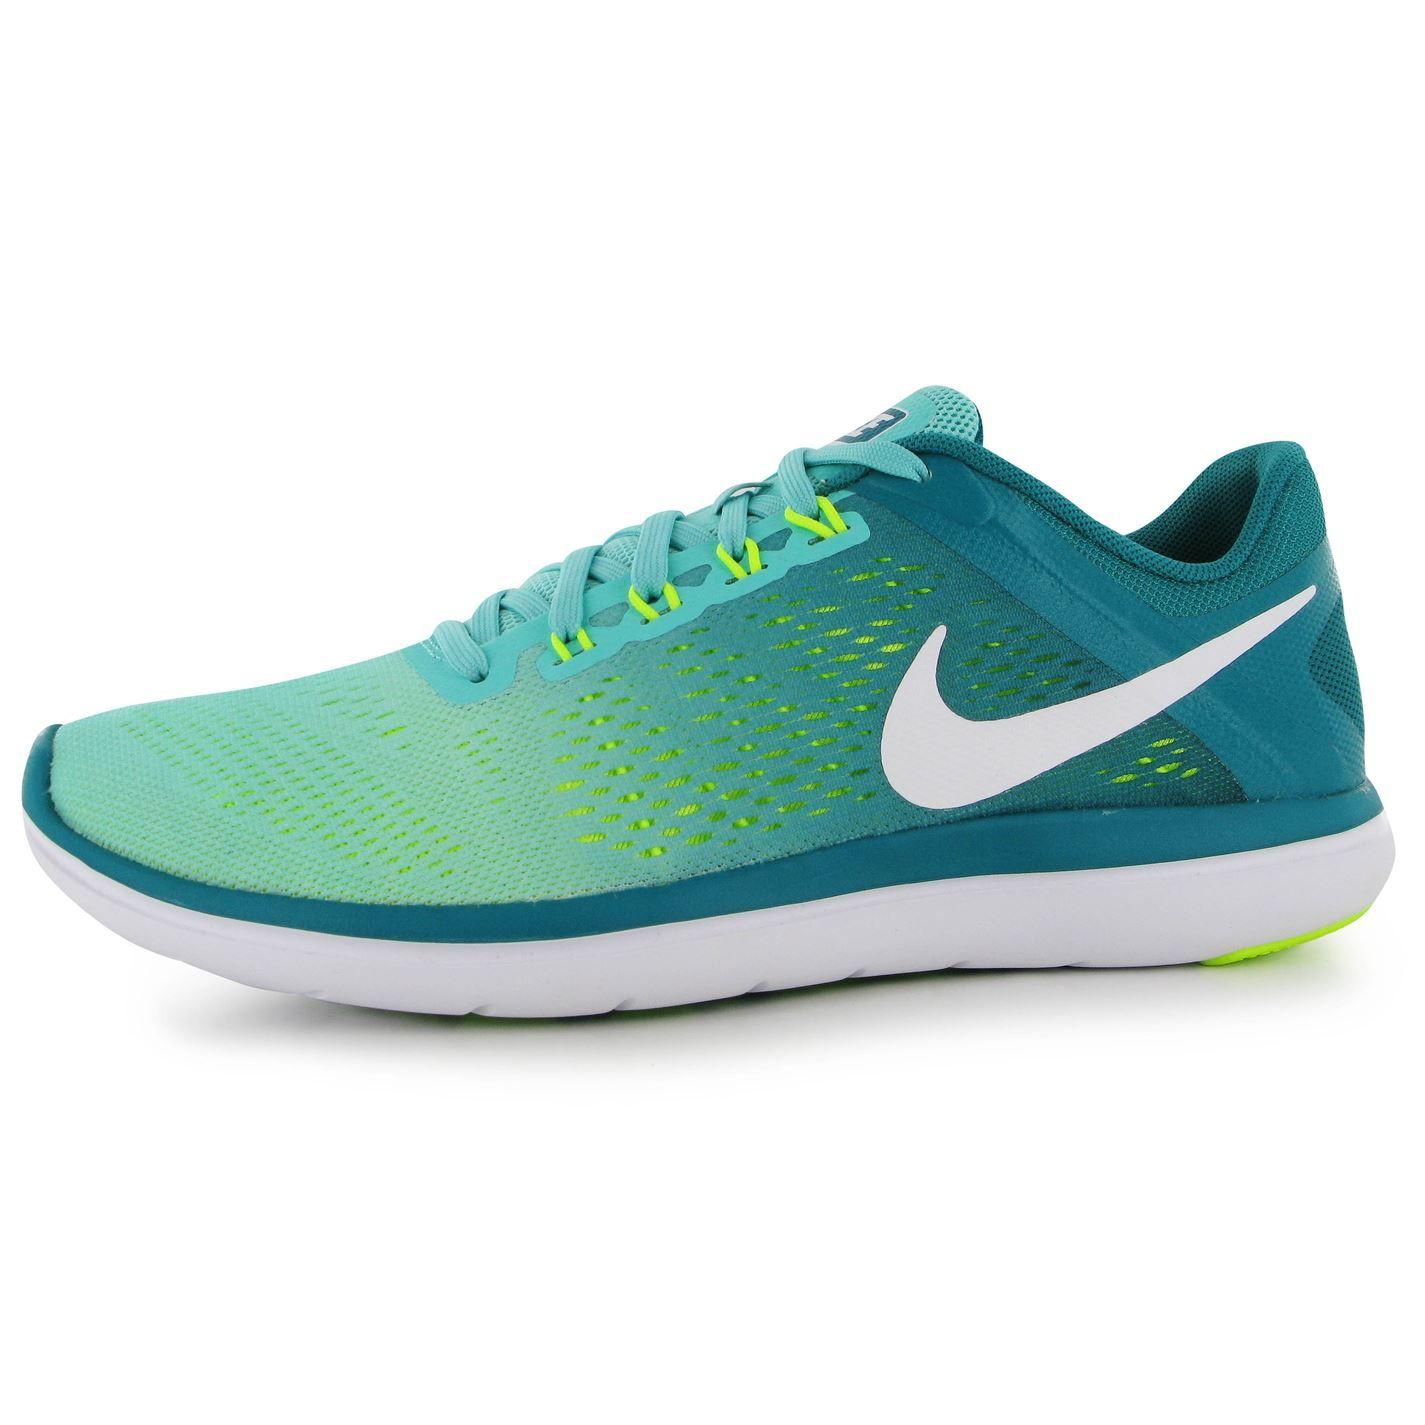 Flex 2016 Run Ladies Running Shoes